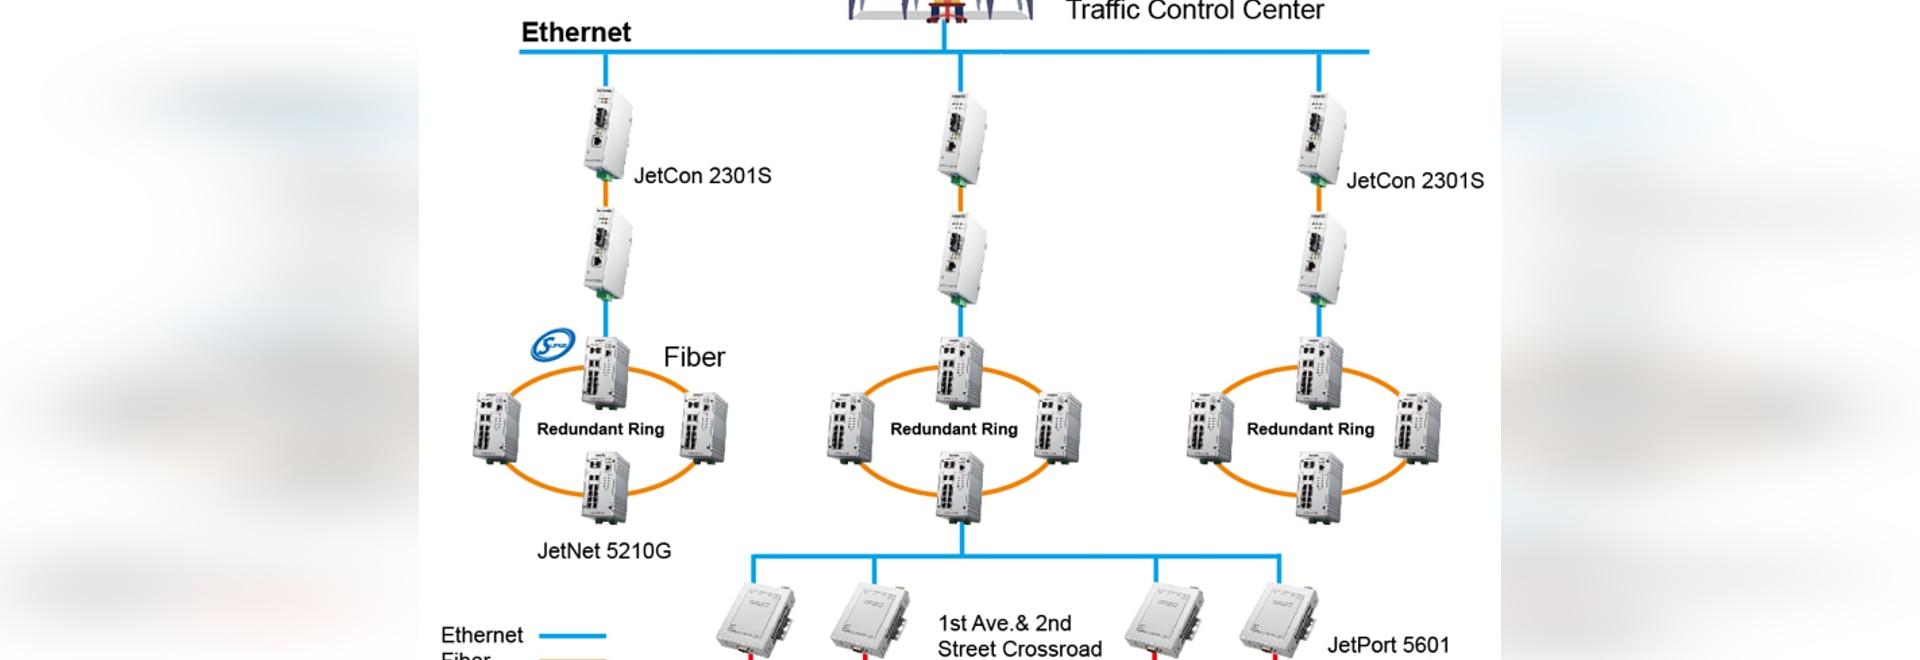 Centre de contrôle de la circulation